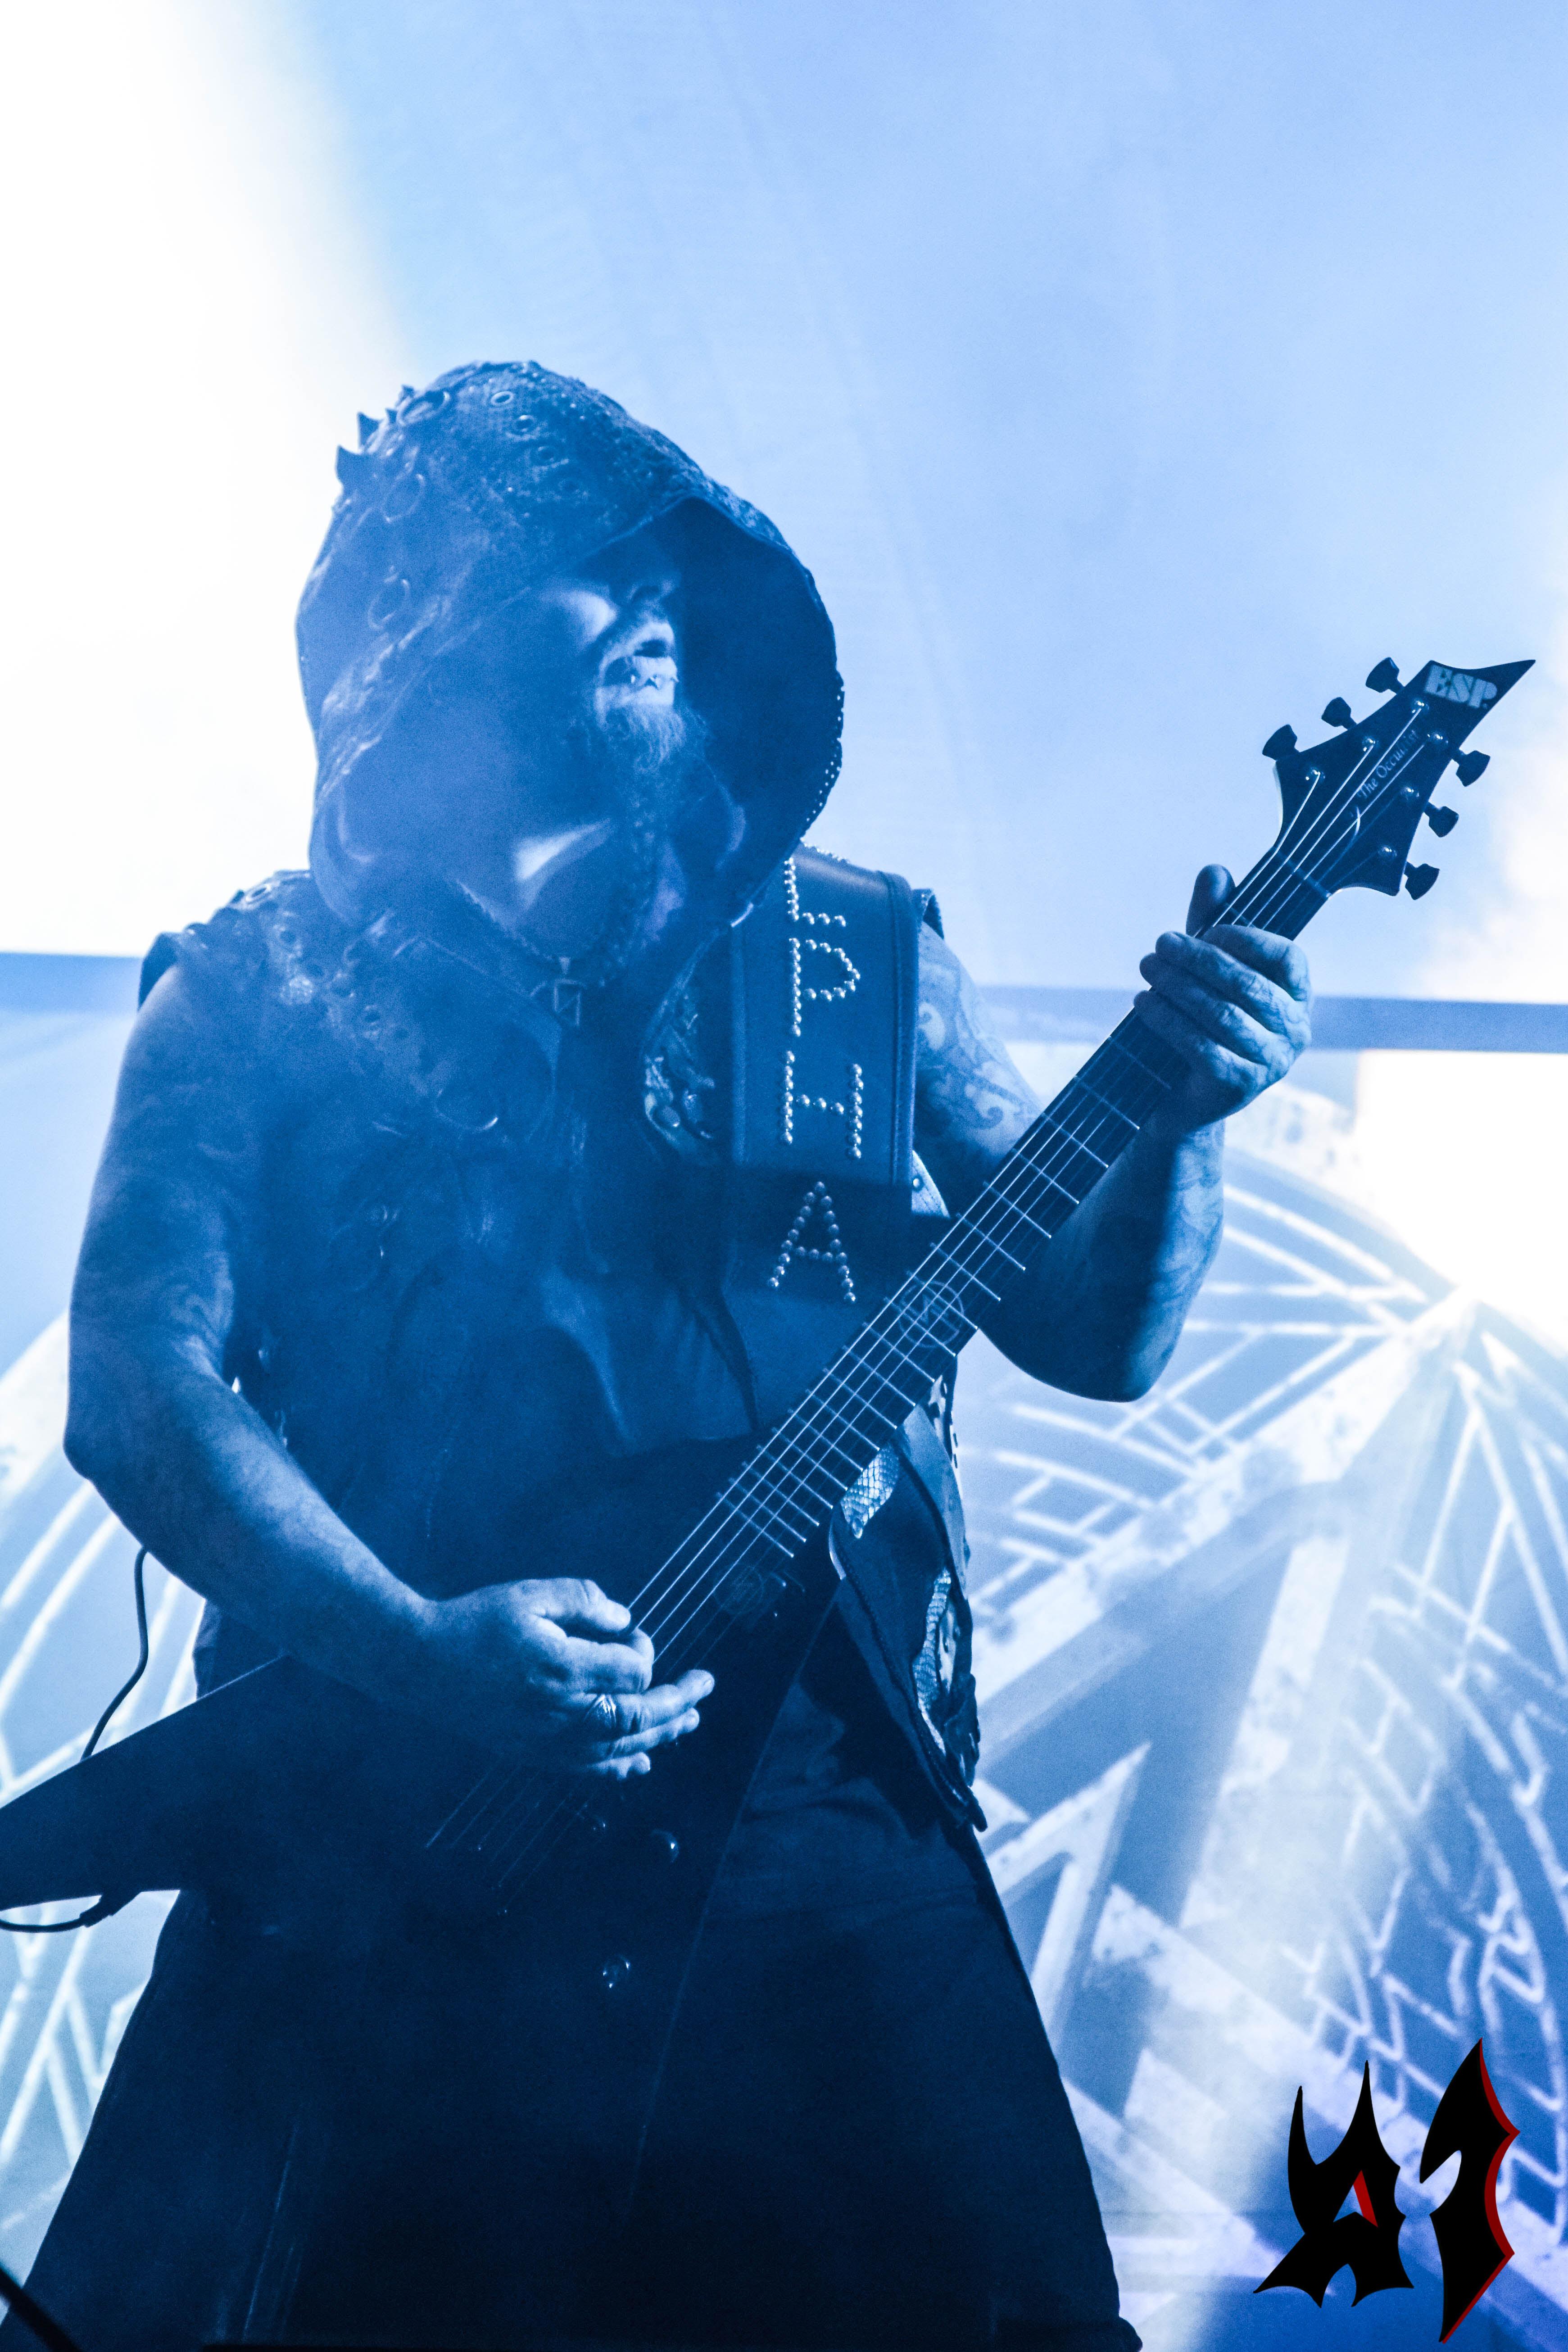 Hellfest - Jour 2 - Dimmu Borgir 20